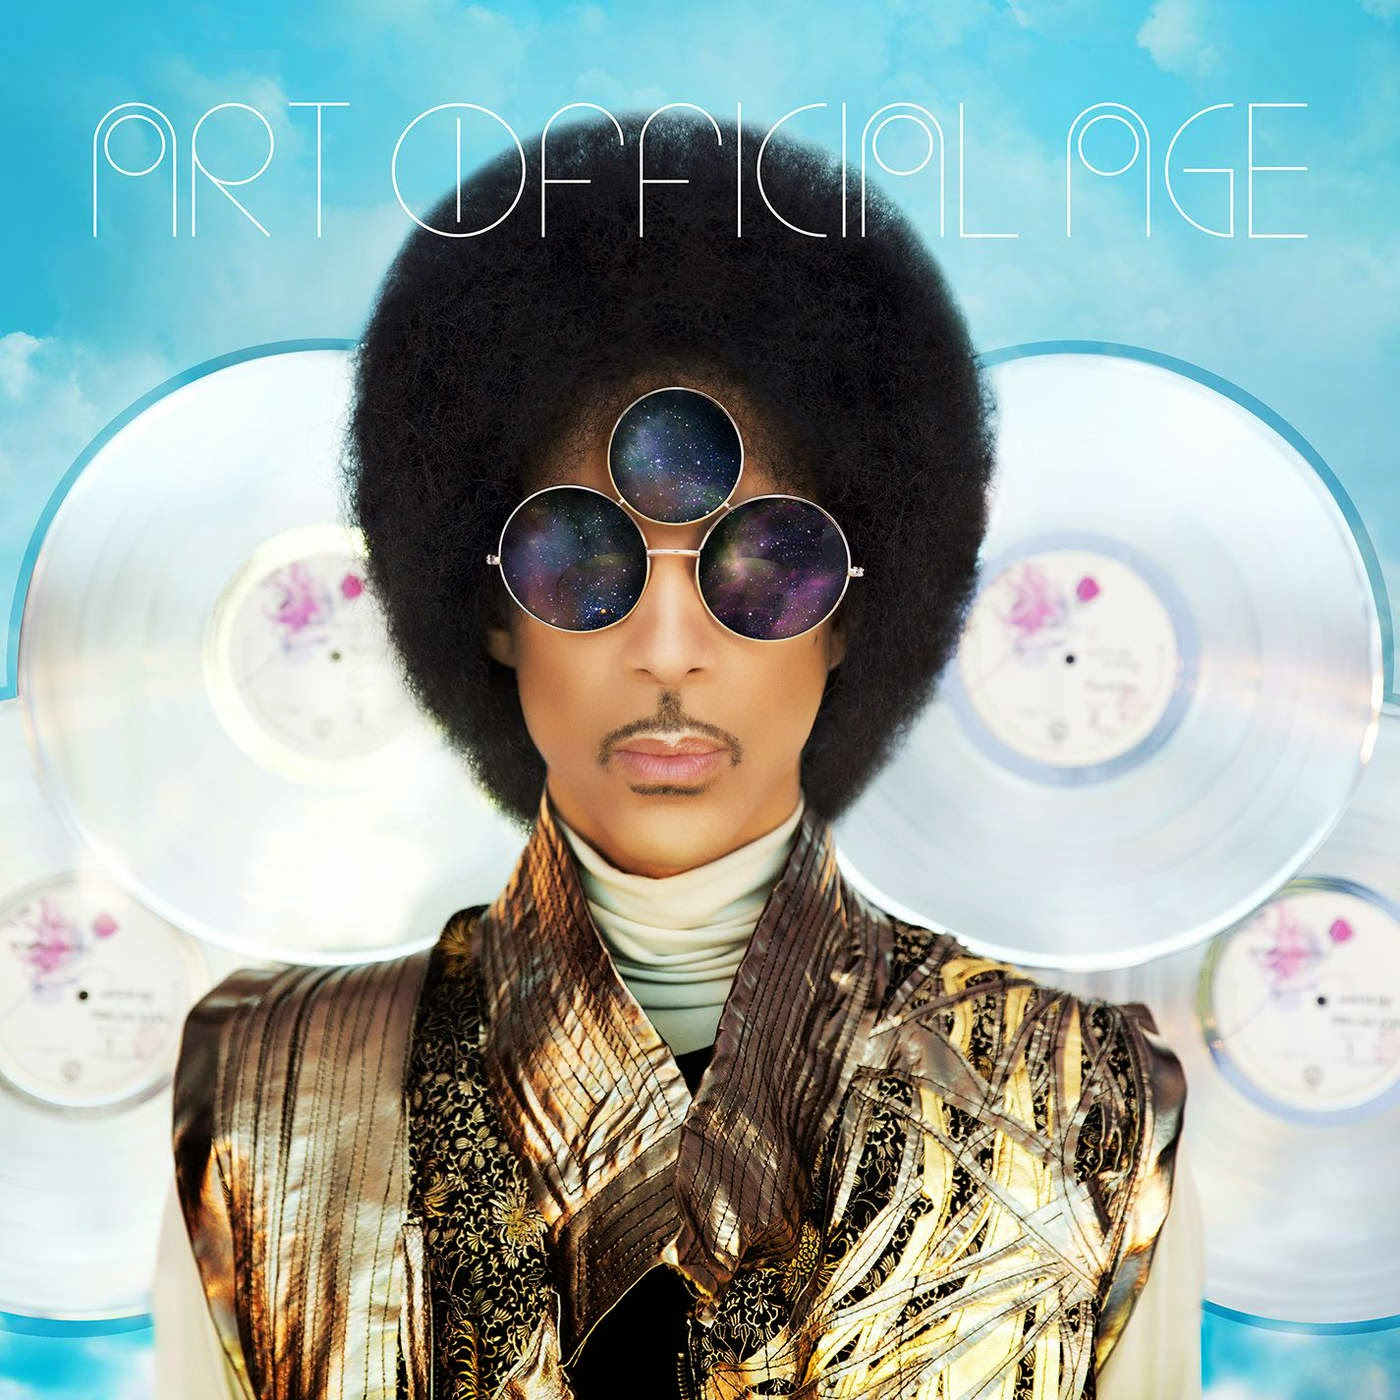 http://i2.wp.com/fatgayvegan.com/wp-content/uploads/2014/10/prince-art-official-age.jpg?fit=1400%2C1400